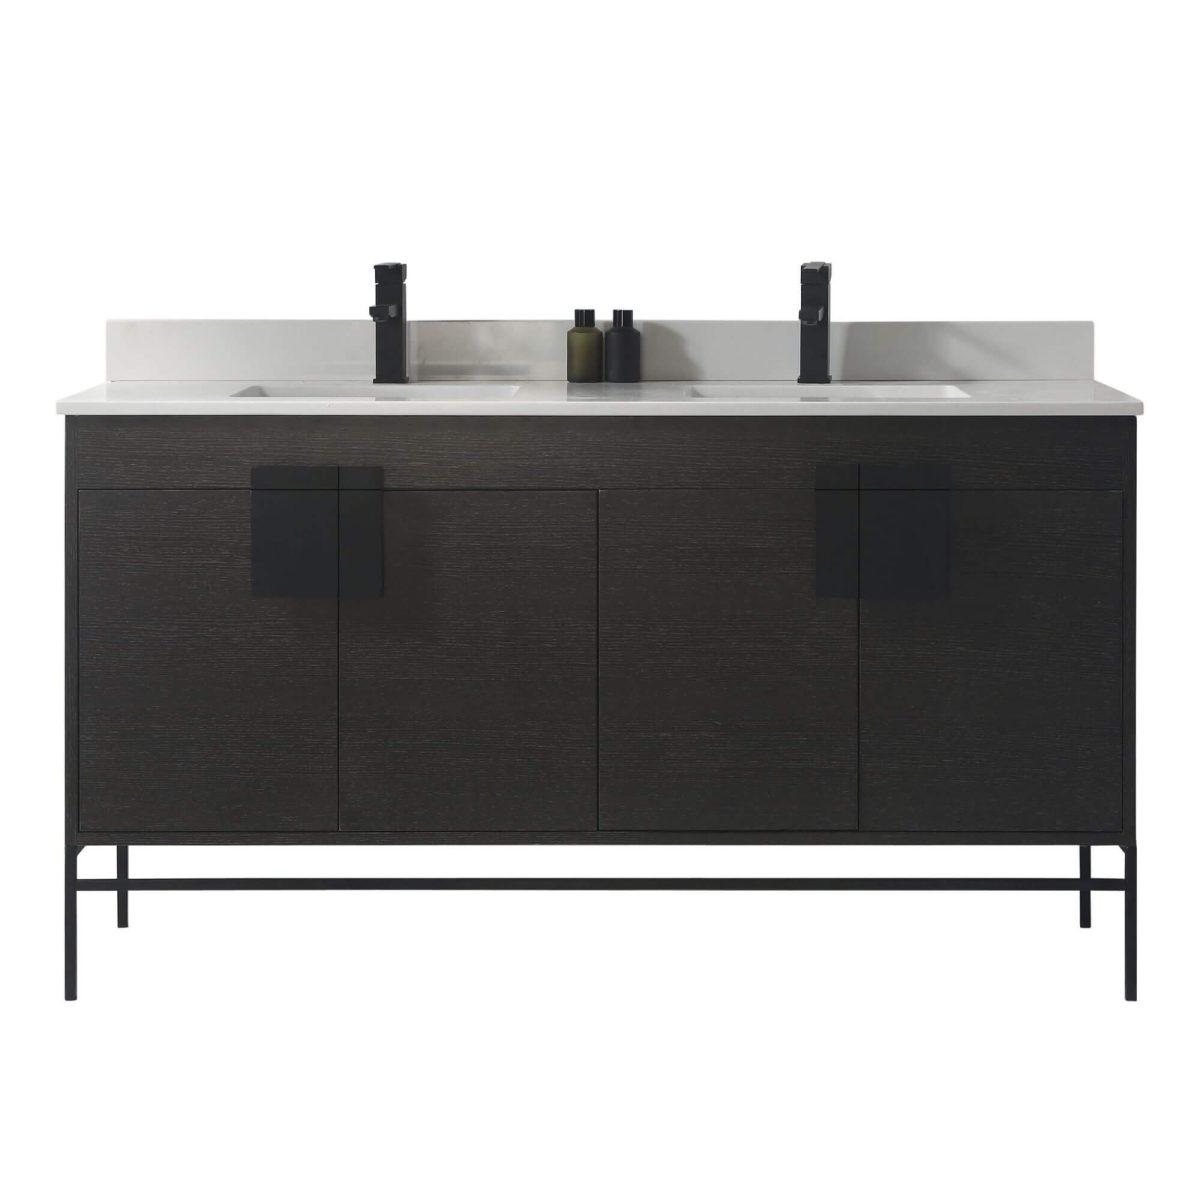 "Shawbridge 60"" Modern Double Bathroom Vanity  Black Oak Straight Grain with Black Hardware"